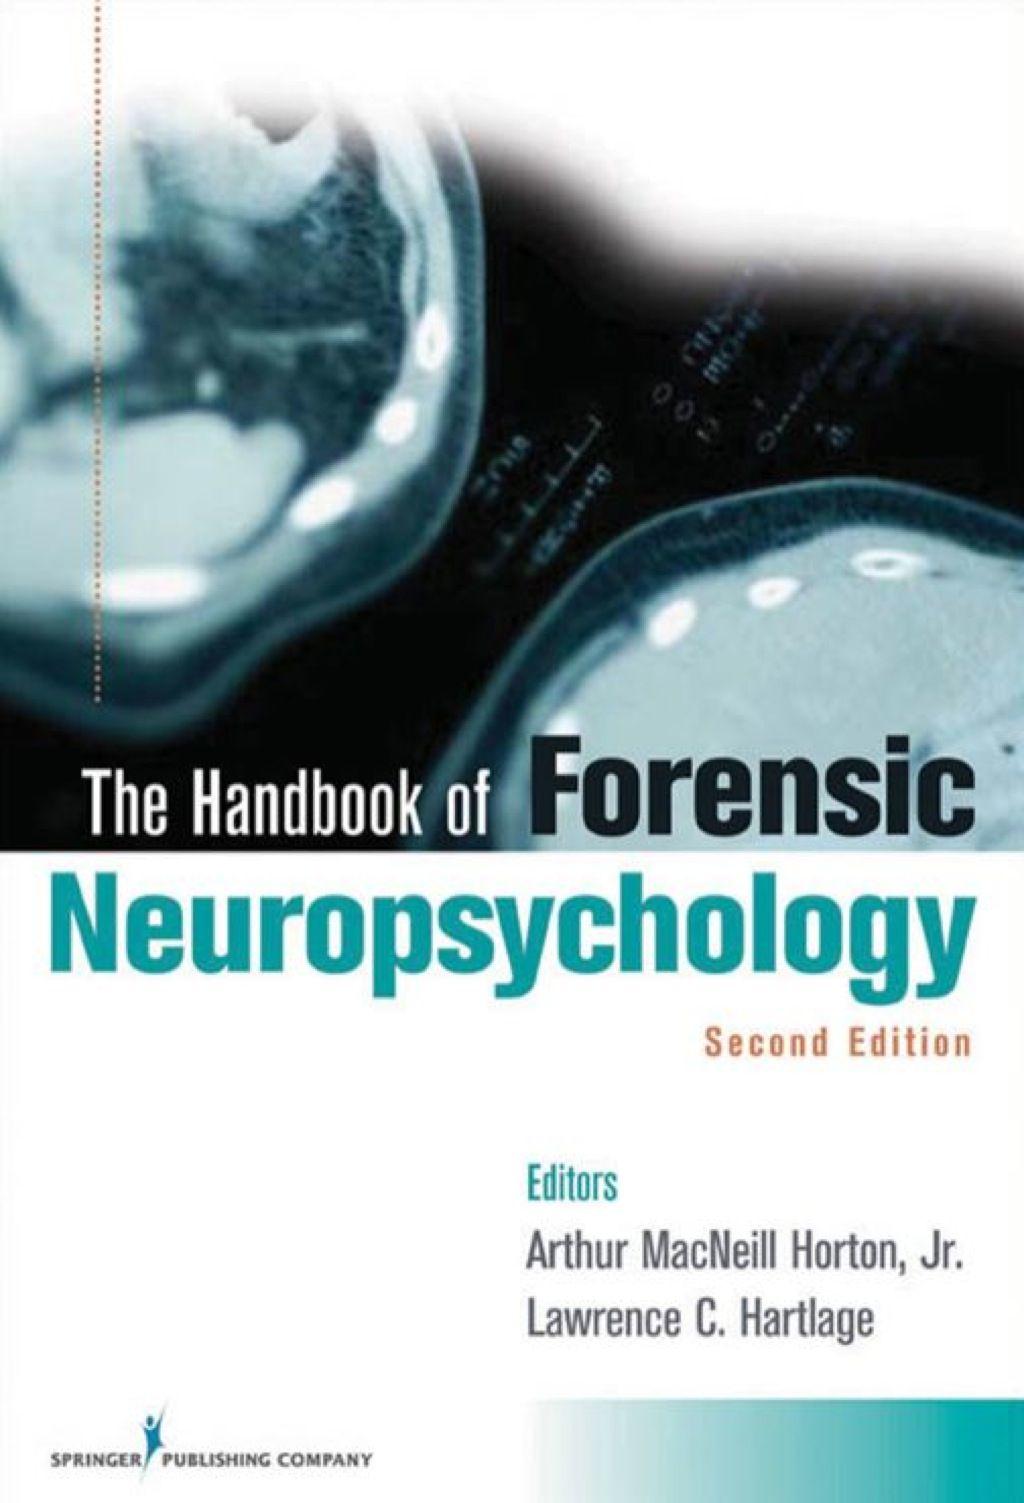 Handbook of forensic neuropsychology second edition ebook